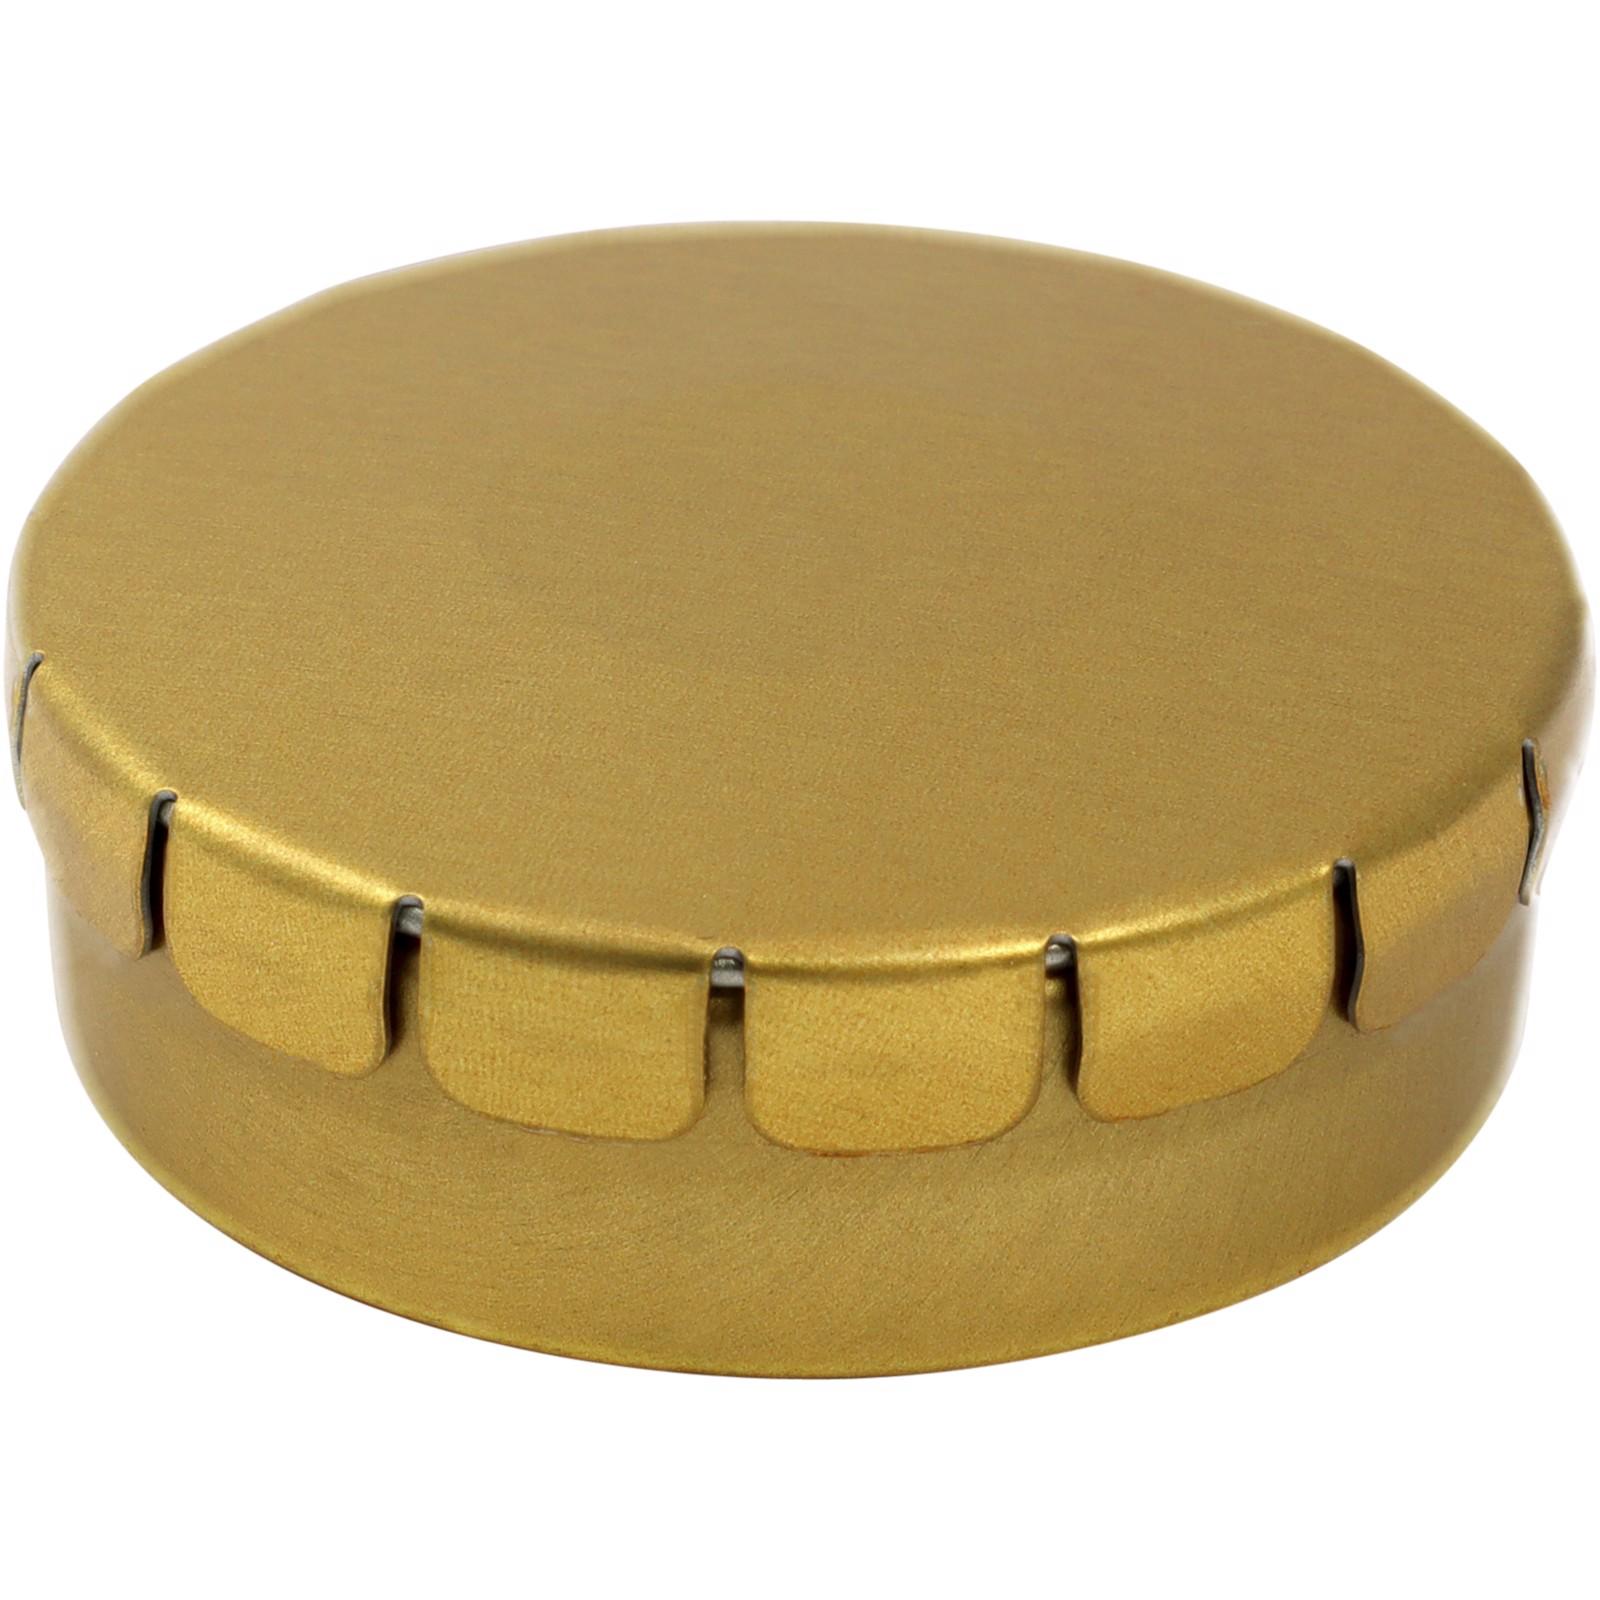 Clic clac jahodové bonbony ve tvaru srdíček - Zlatá